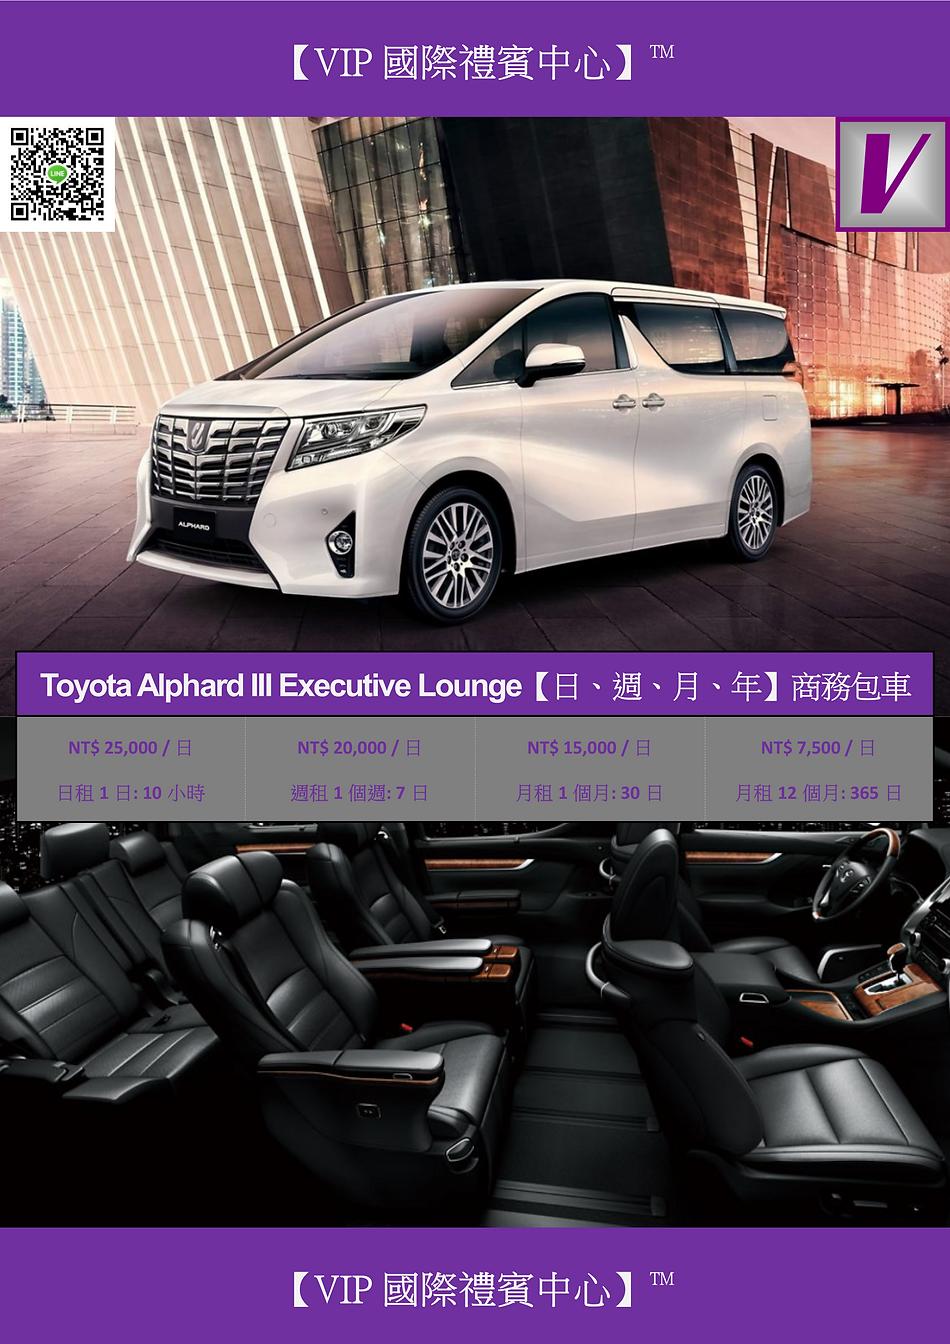 VIP國際禮賓中心 TOYOTA ALPHARD III EXECUTIVE LOUNGE 臺北市區接送包車